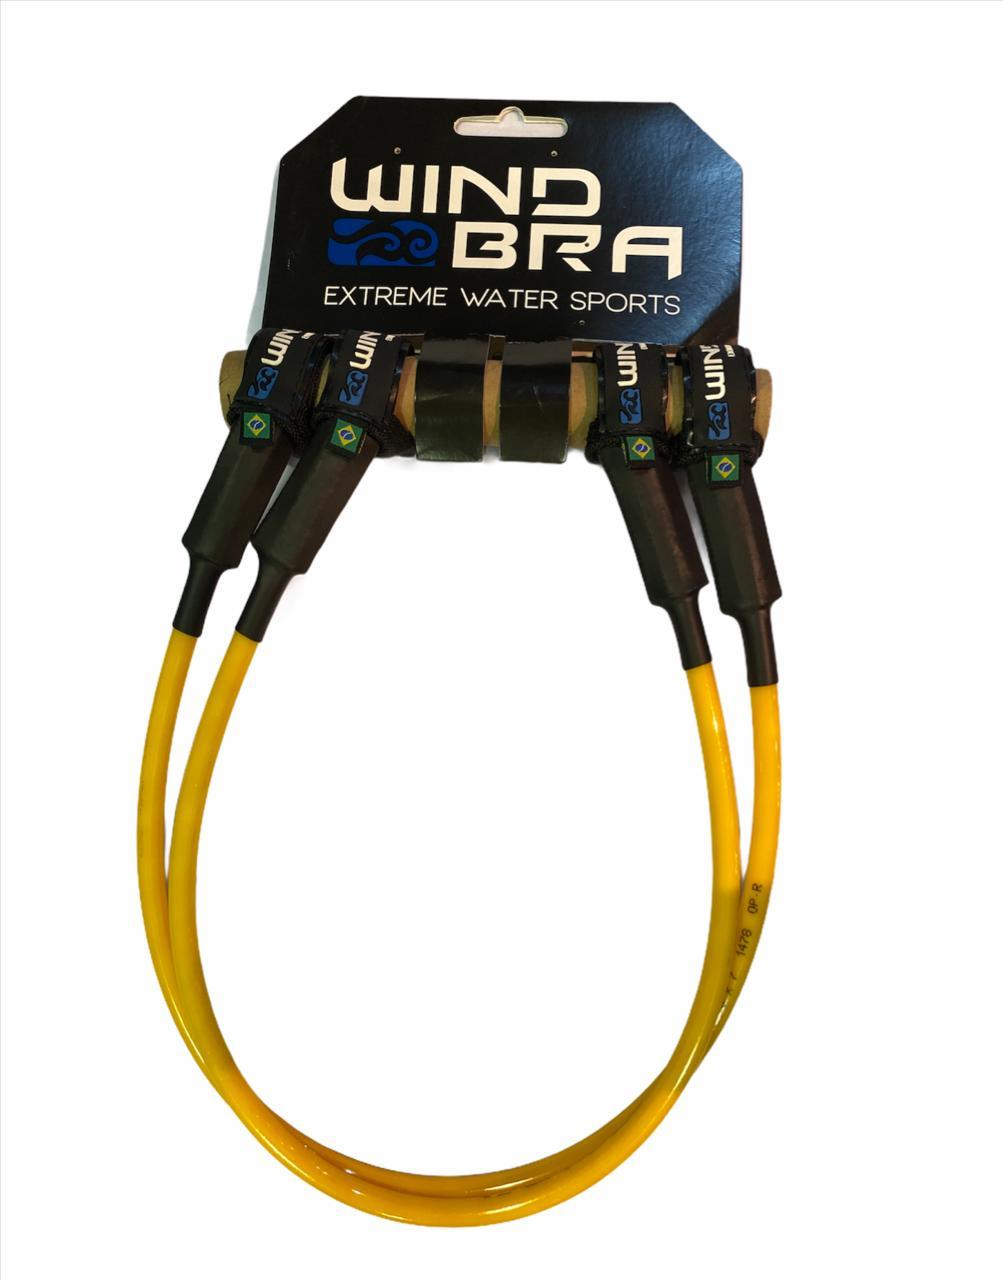 Kit Trapézio WindBra Fixo para Windsurf